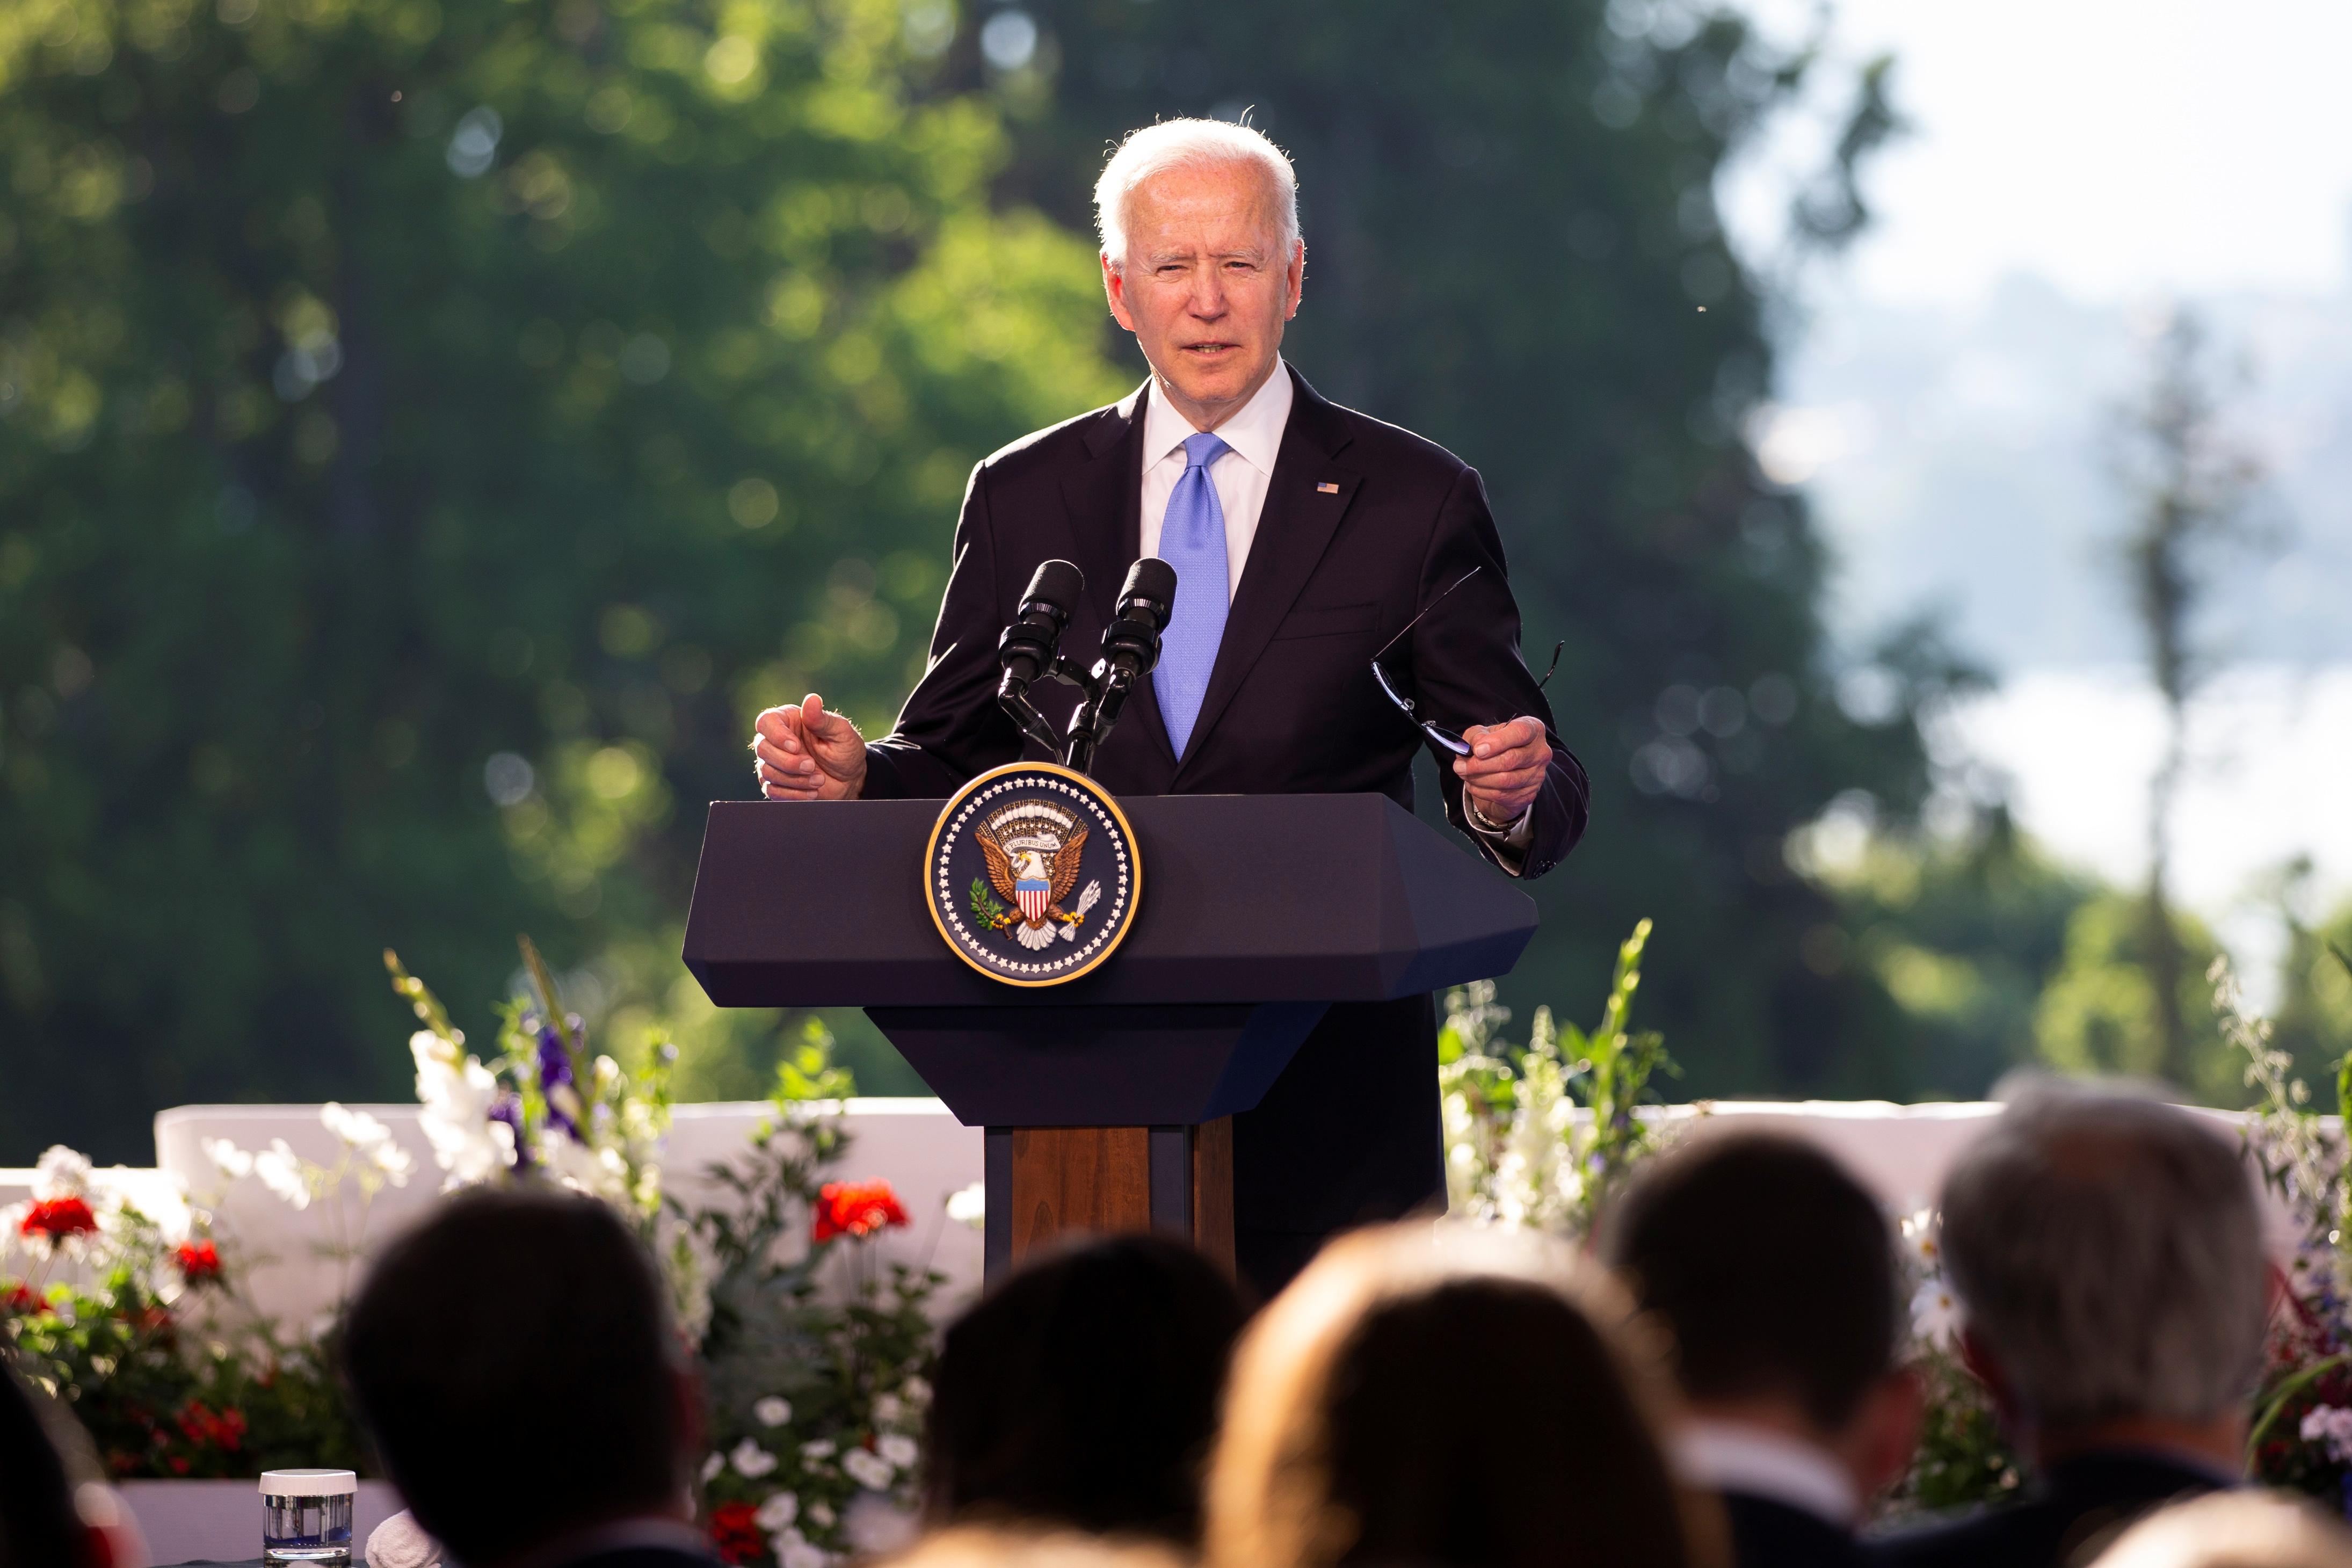 U.S. President Joe Biden holds a news conference after the U.S.-Russia summit with Russia's President Vladimir Putin, in Geneva, Switzerland, June 16, 2021. Peter Klaunzer/ Pool via REUTERS